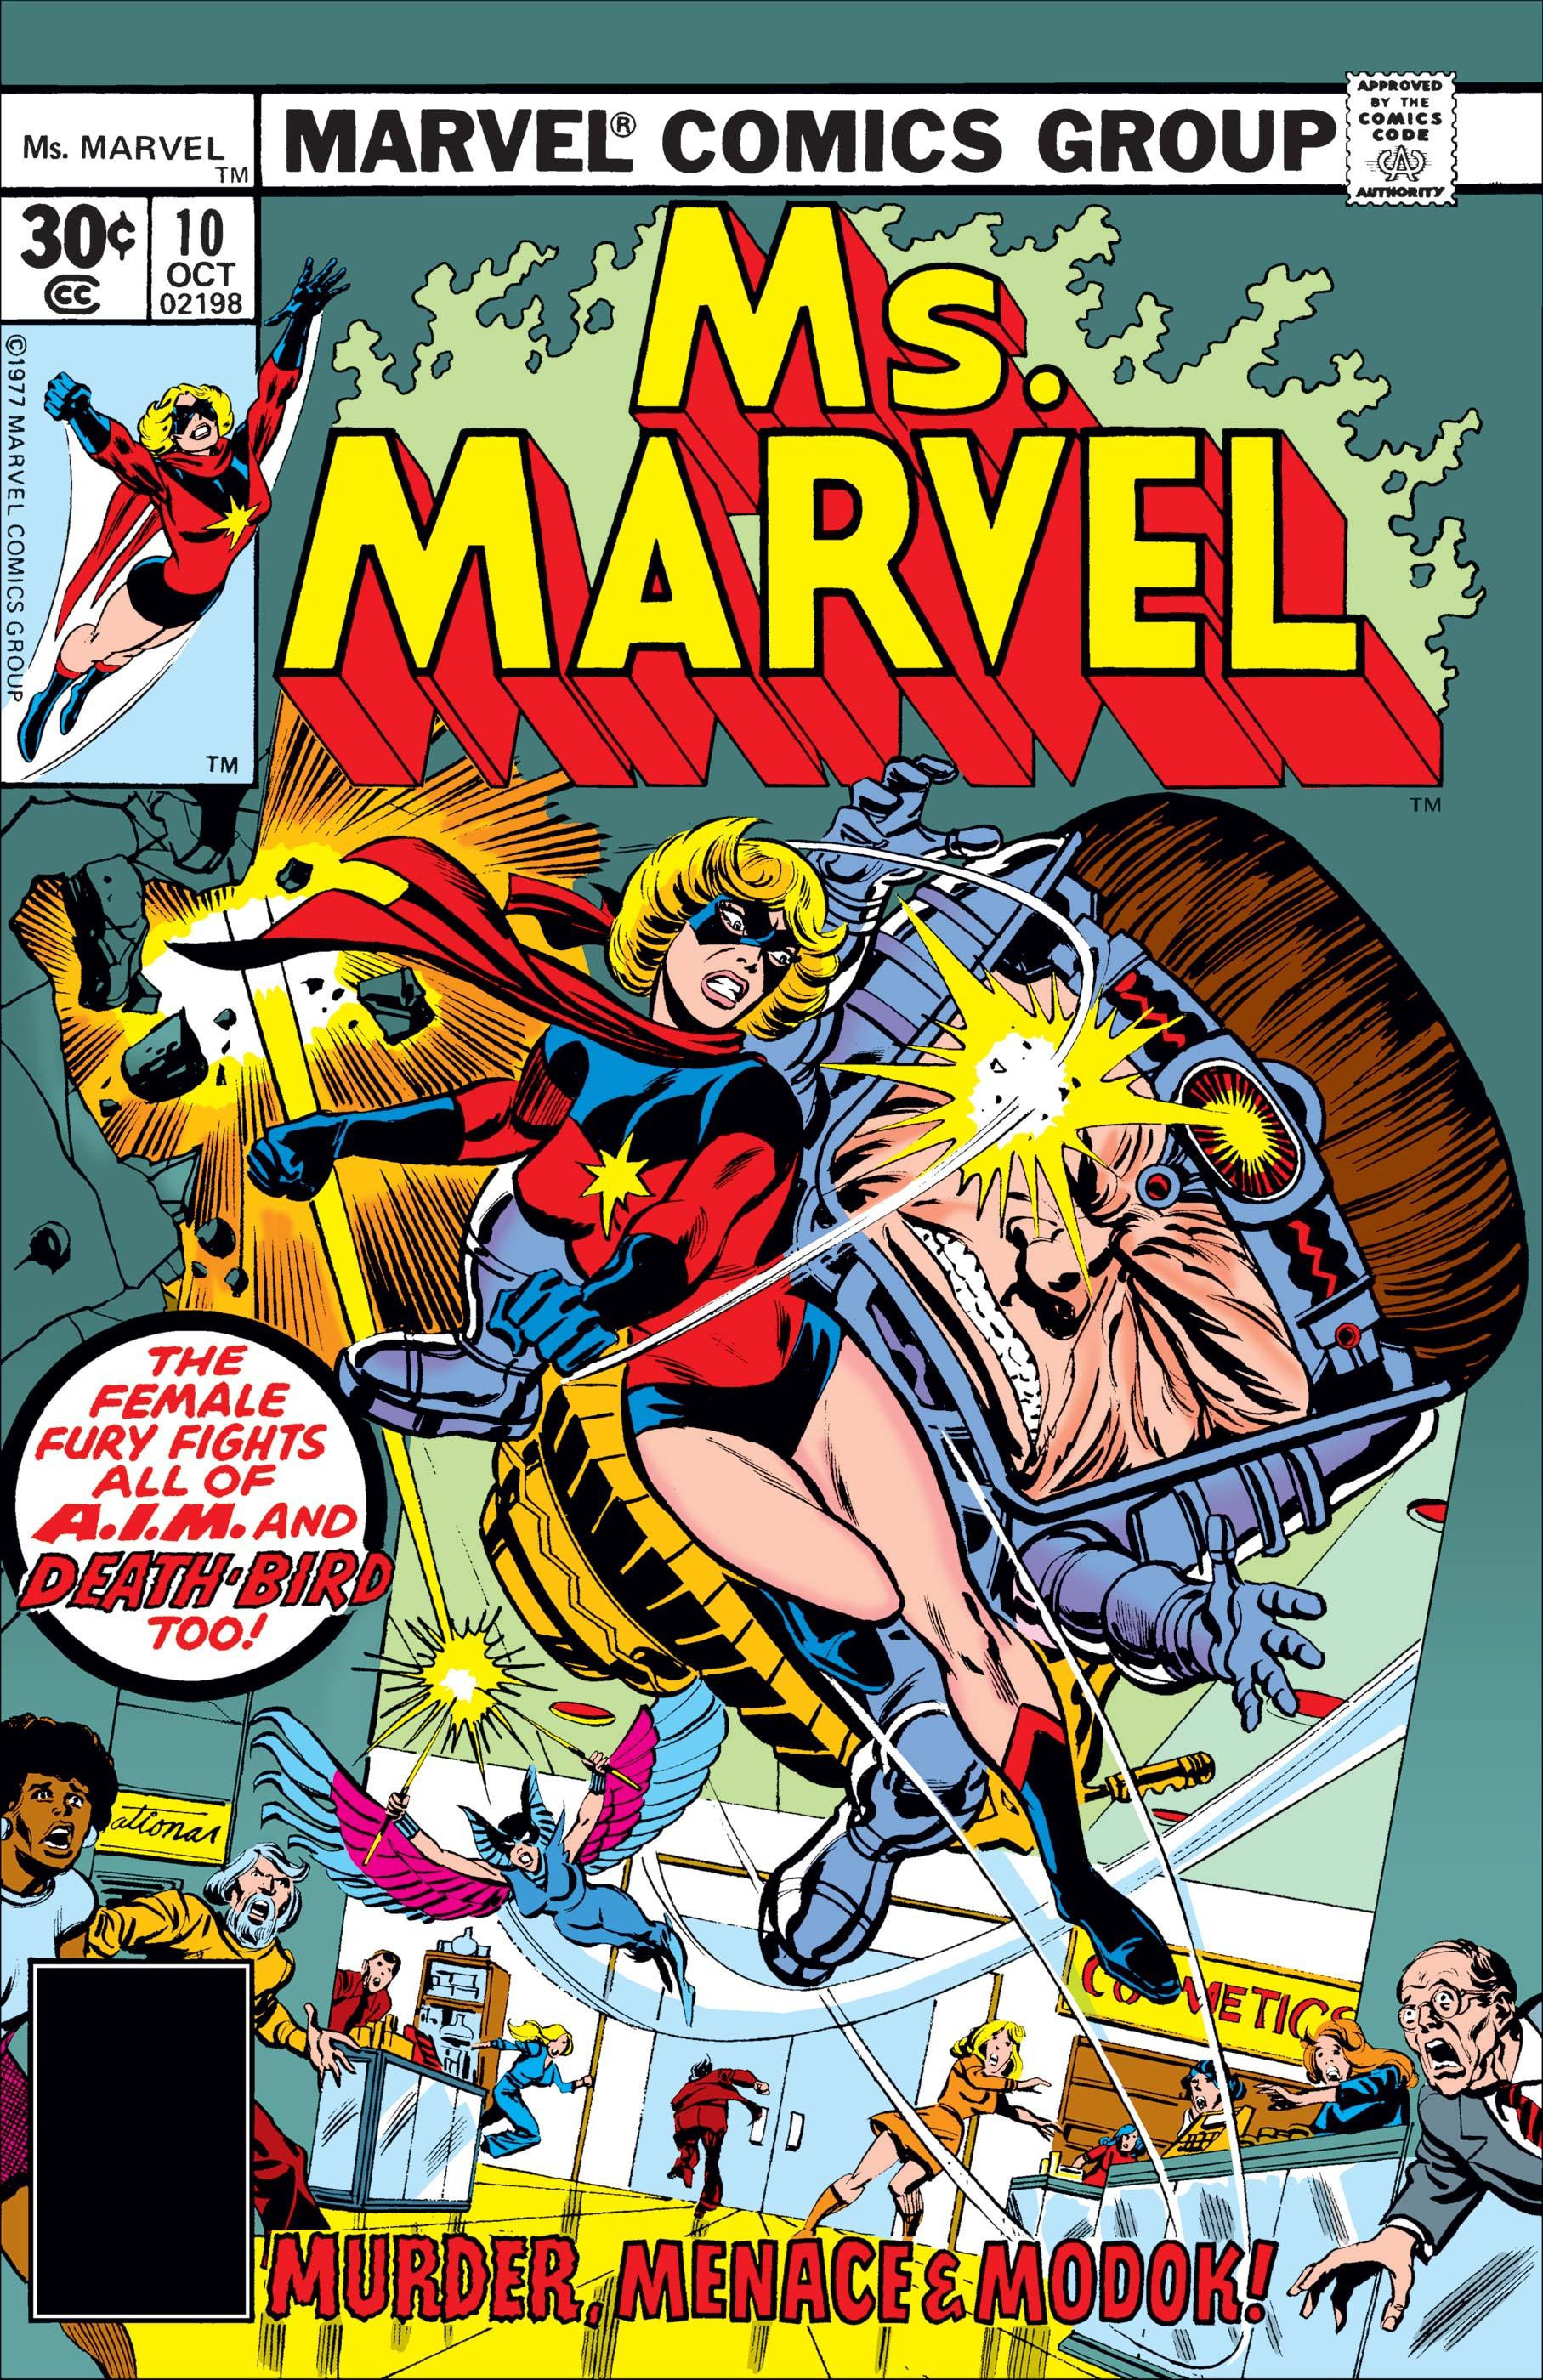 Ms. Marvel (1977) #10